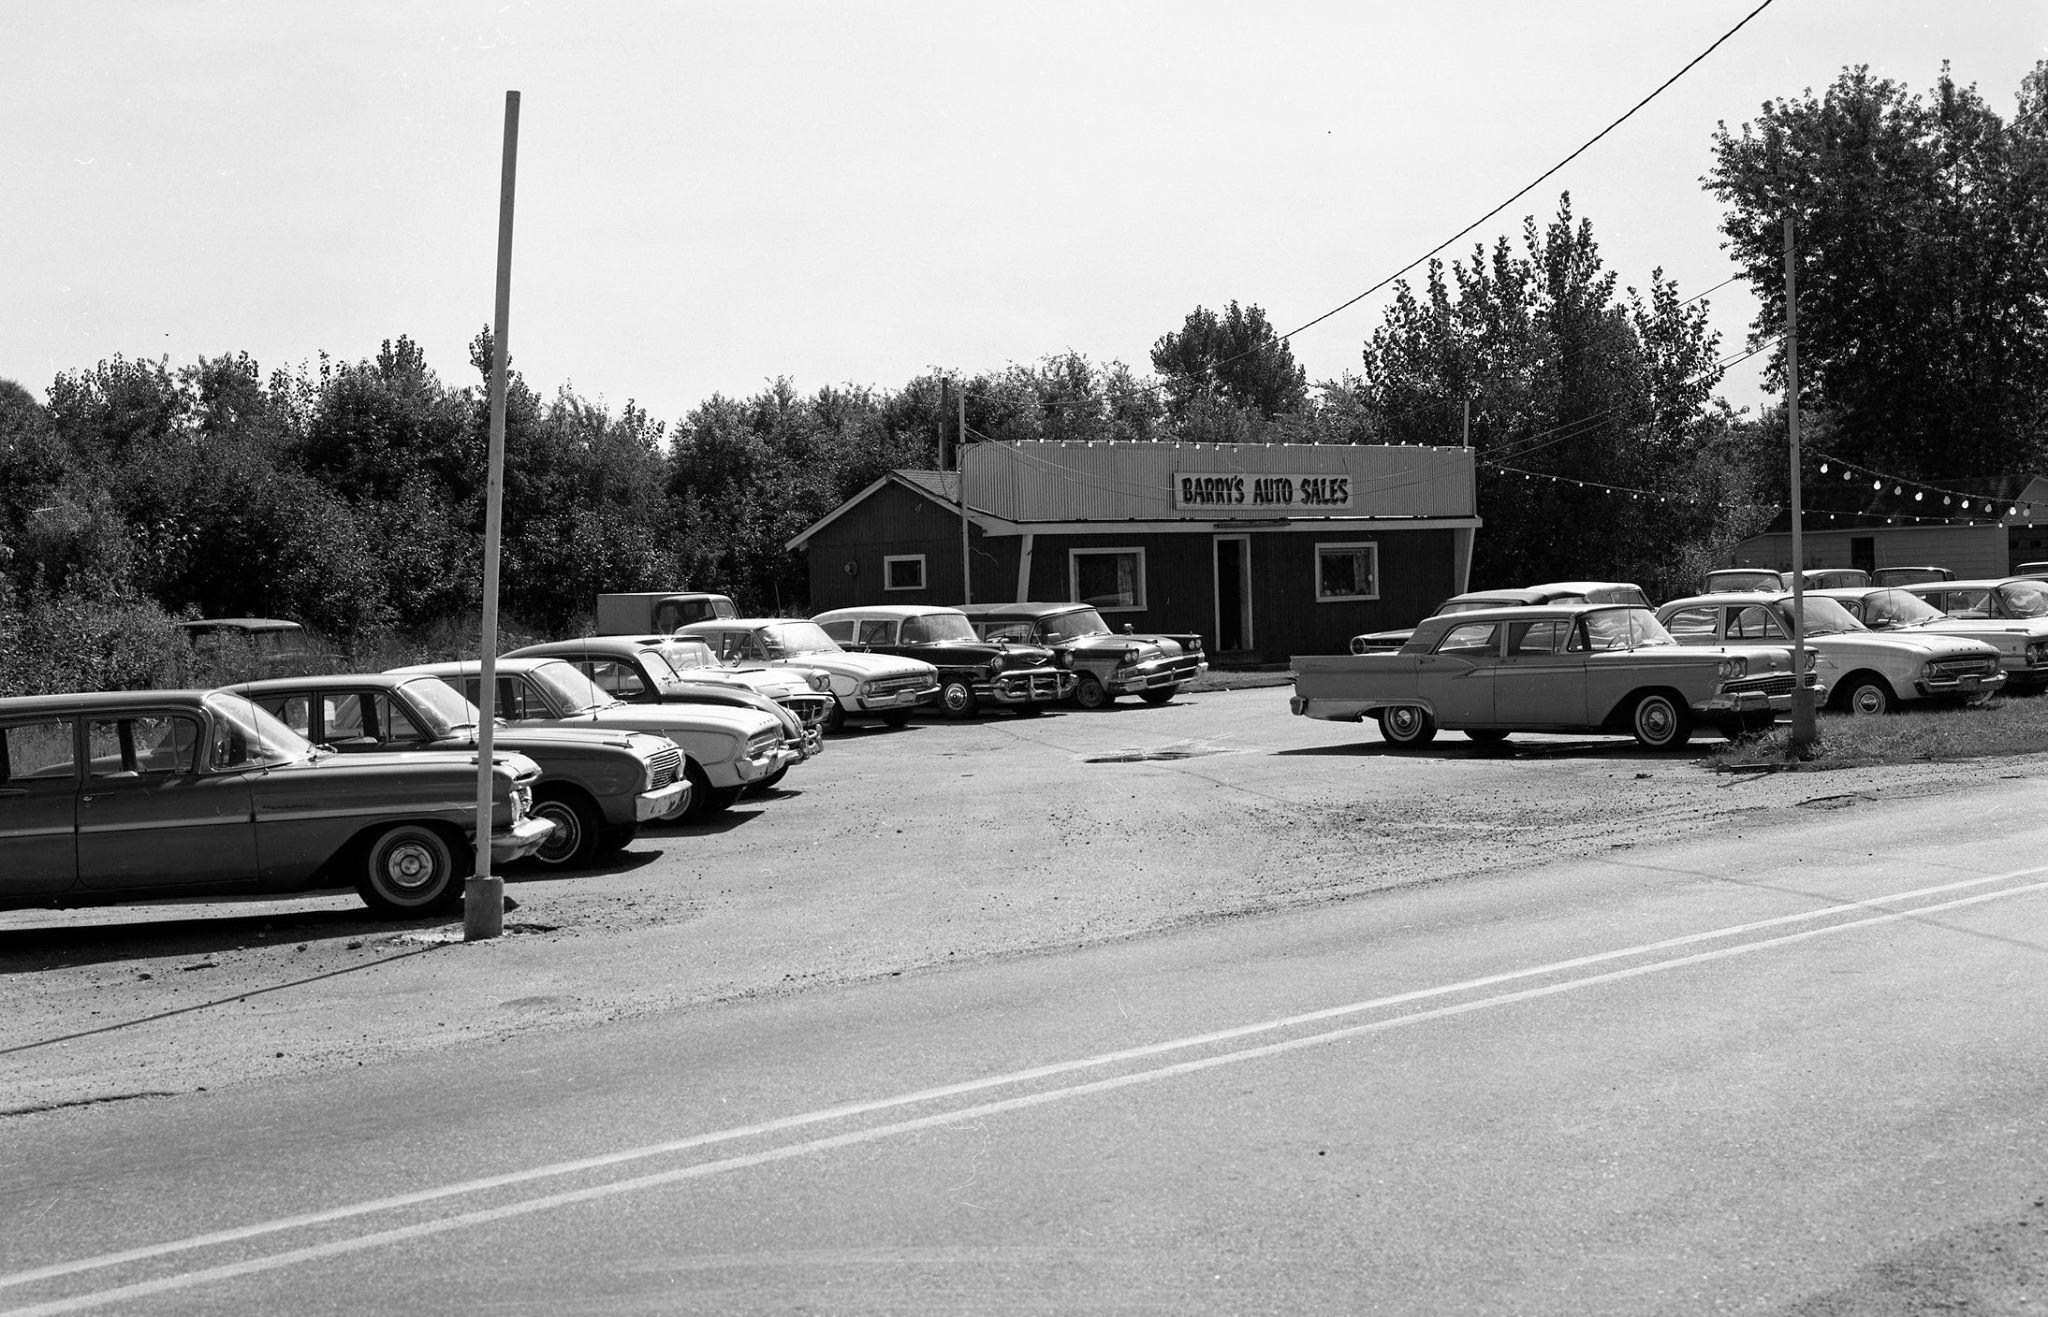 Used Car Lots Burlington Vt